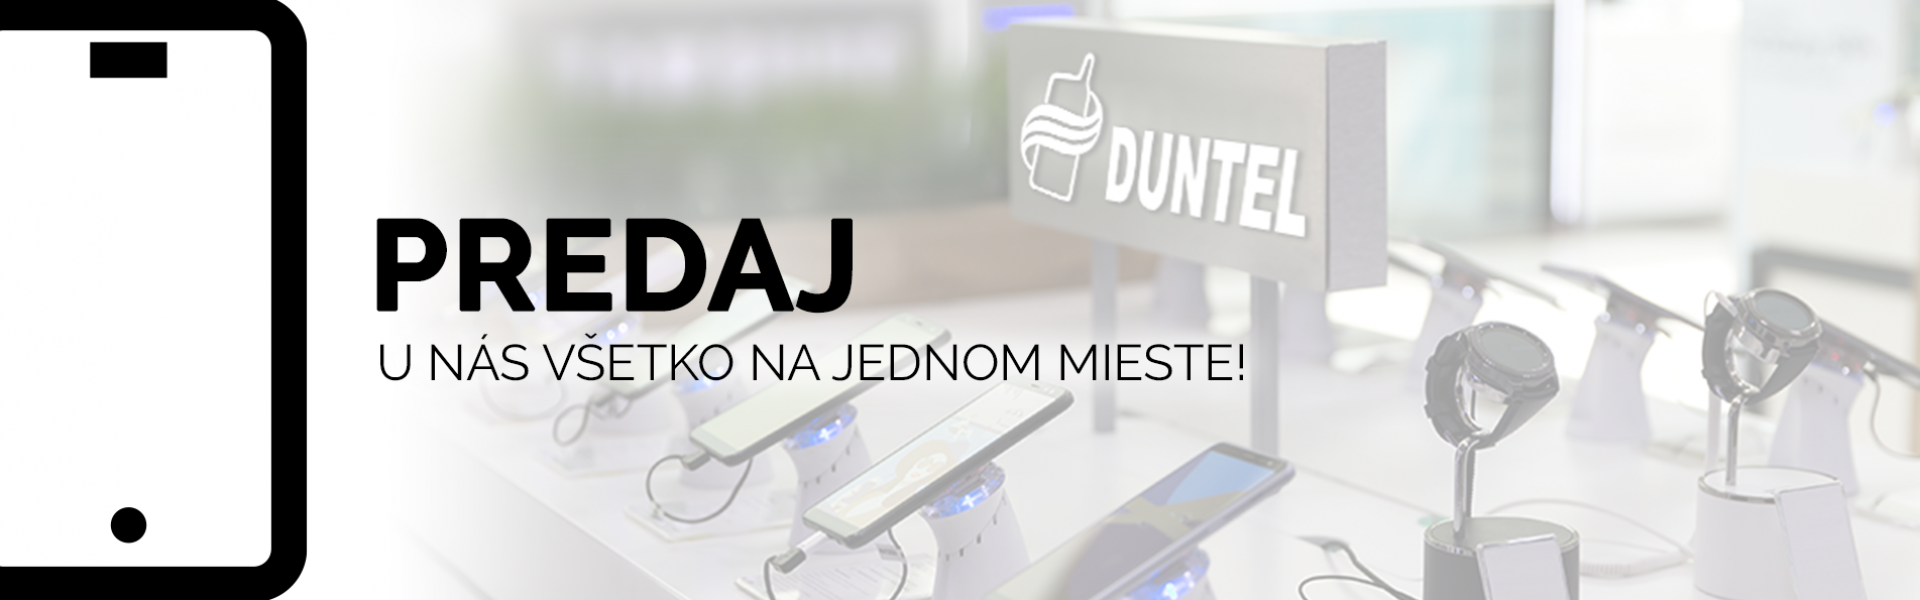 Predaj - Duntel Web Banner2 - Duntel